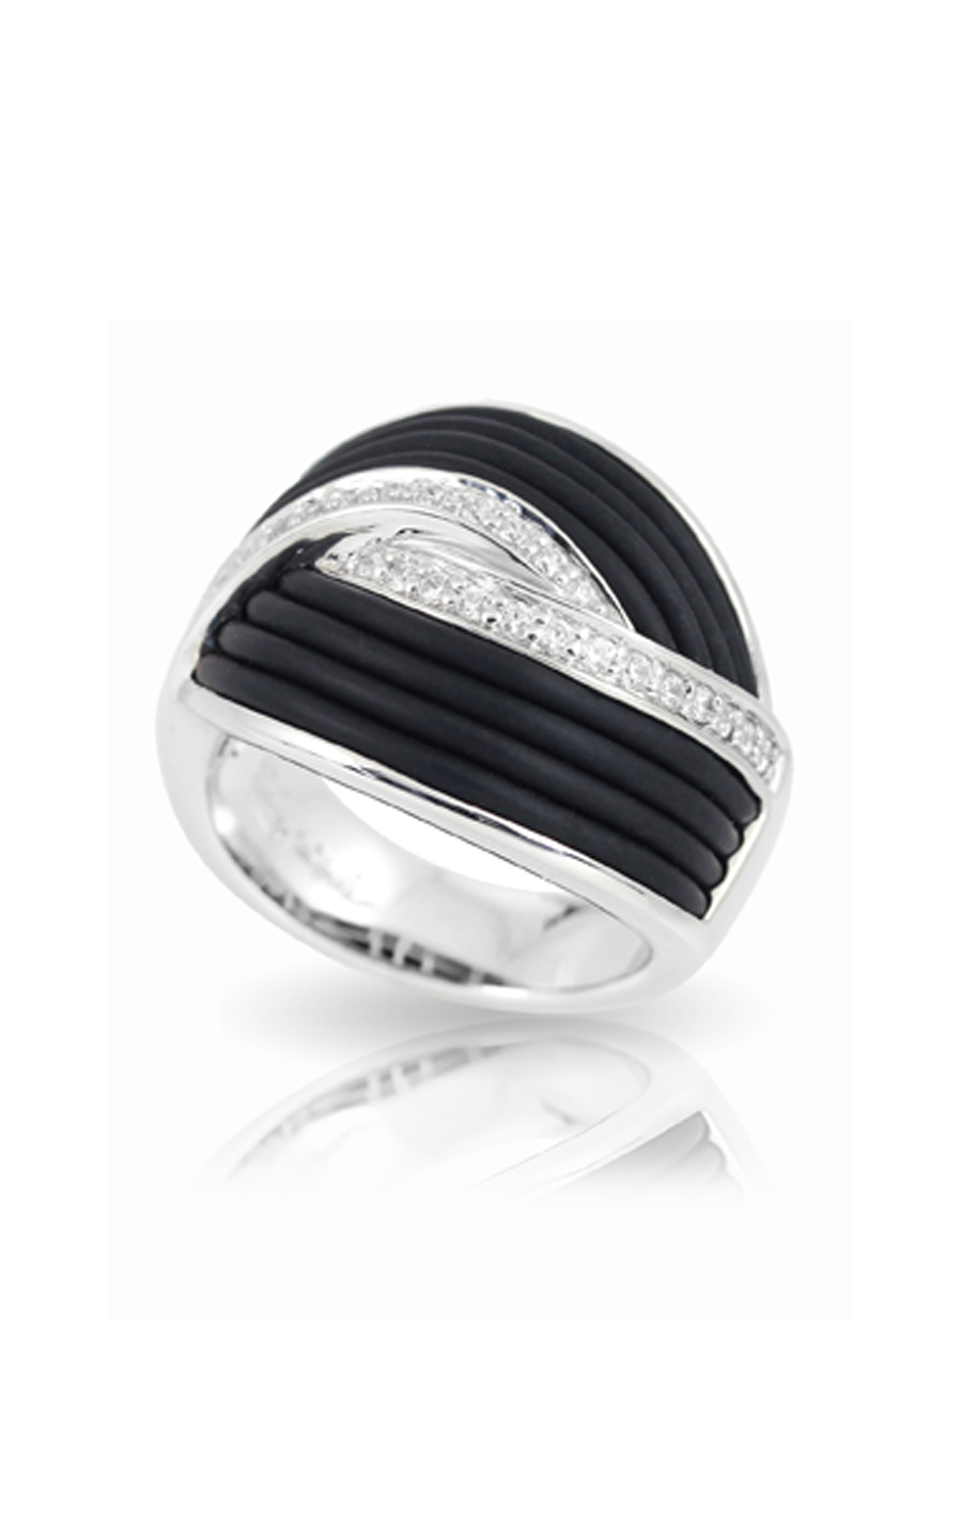 Belle Etoile Eterno Black Ring 01051220501-7 product image